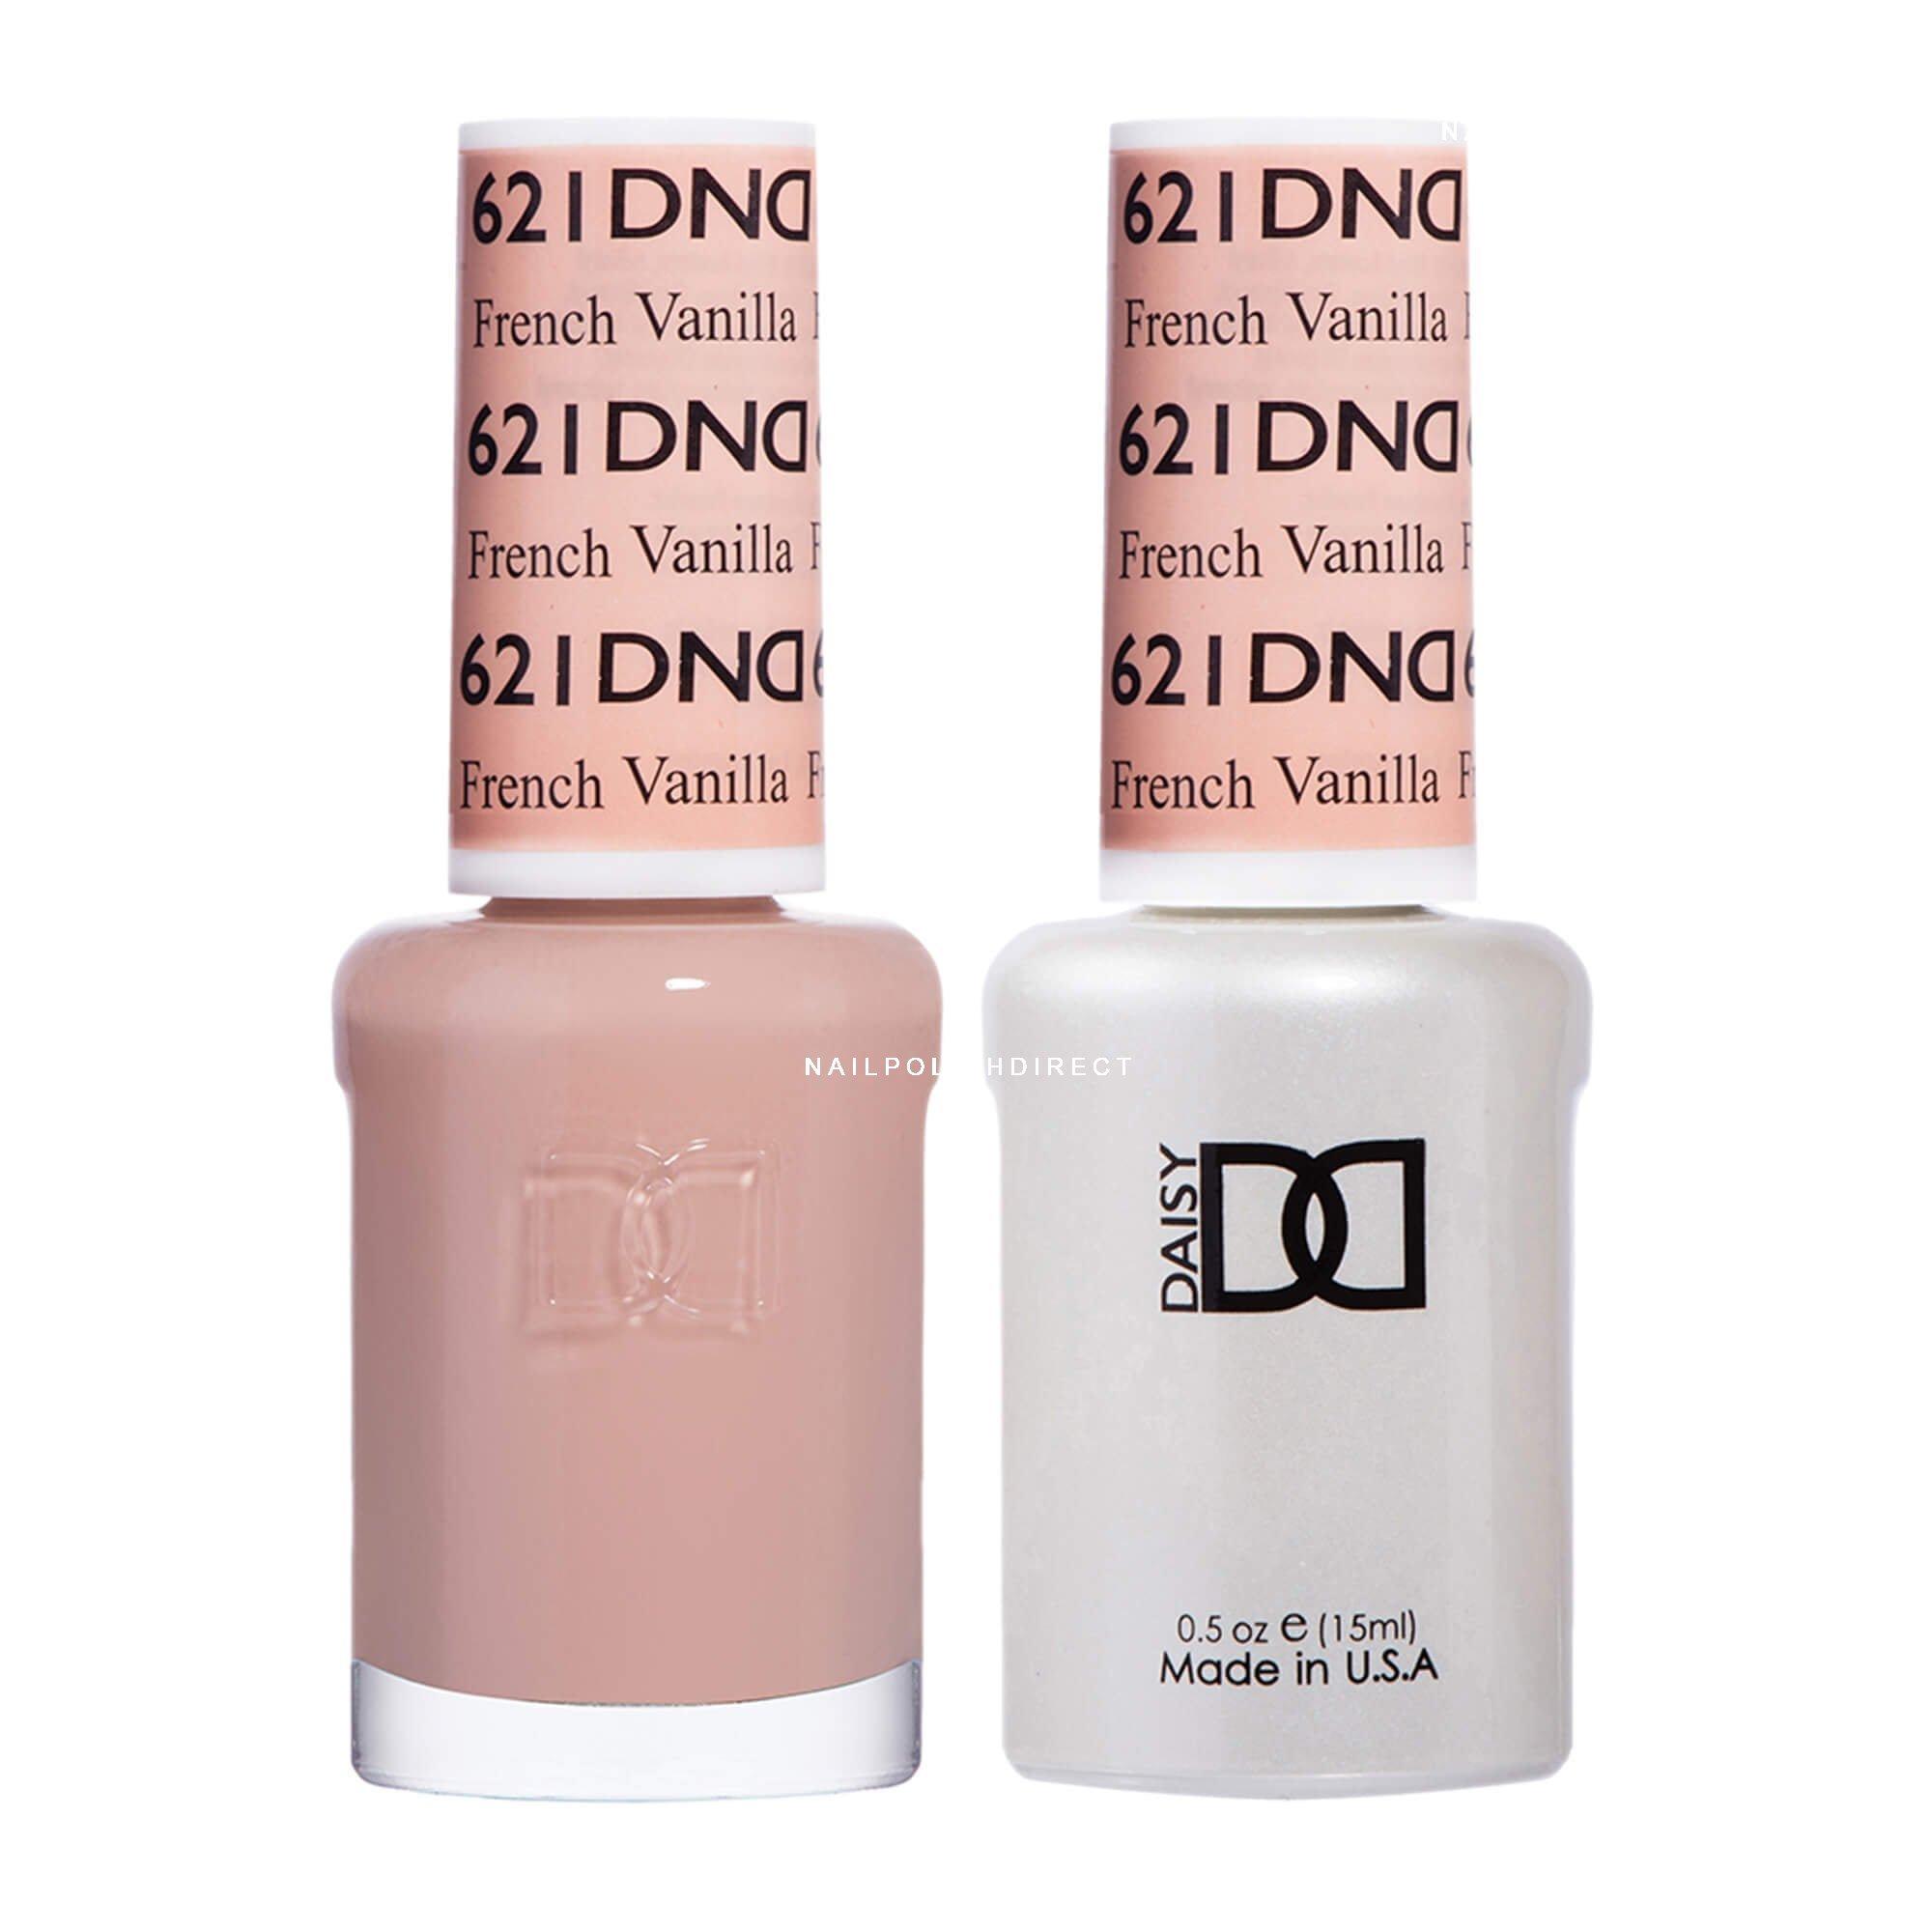 Dnd Duo Gel Nail Polish Set French Vanilla 621 2x15ml